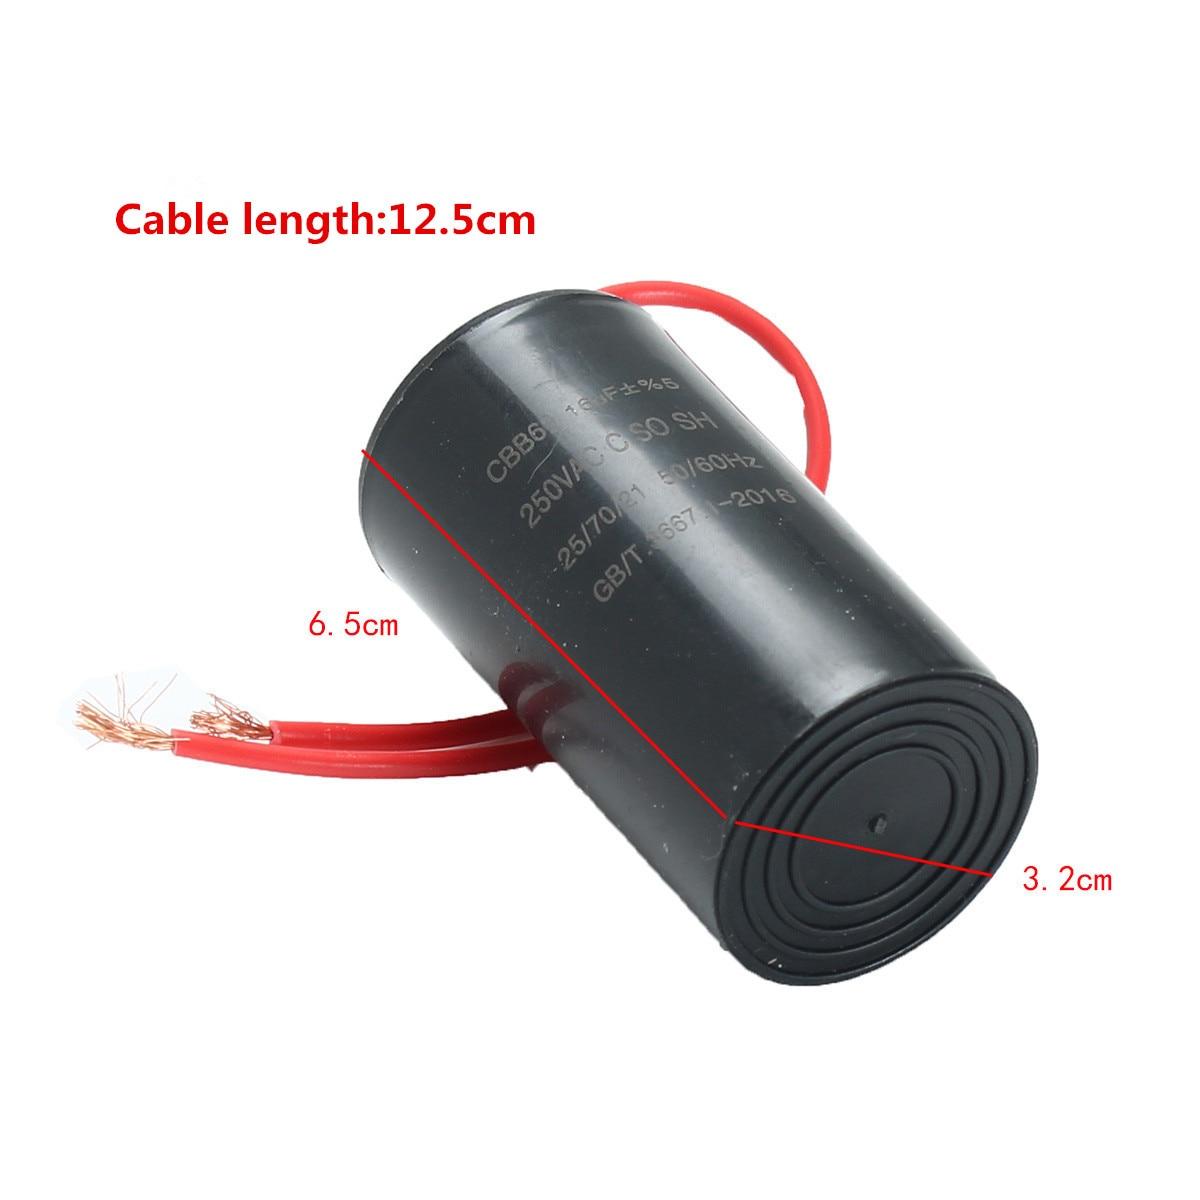 Cbb60 air conditioning washing machine motor start for Ac motor start capacitor